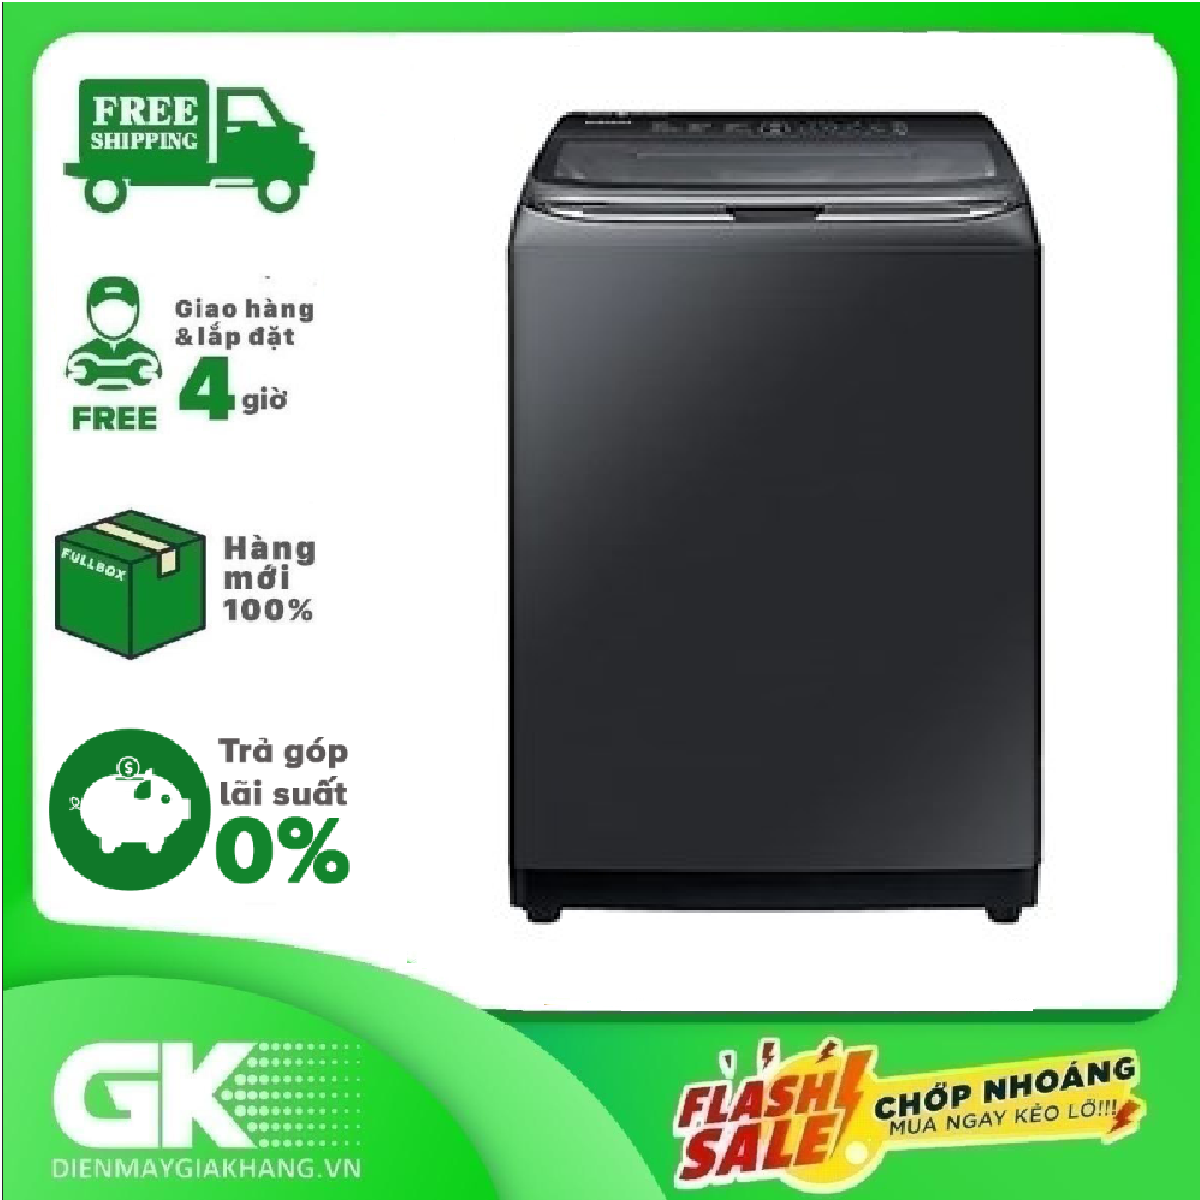 [Trả góp 0%]Máy giặt Samsung Inverter 22 kg WA22R8870GV/SV